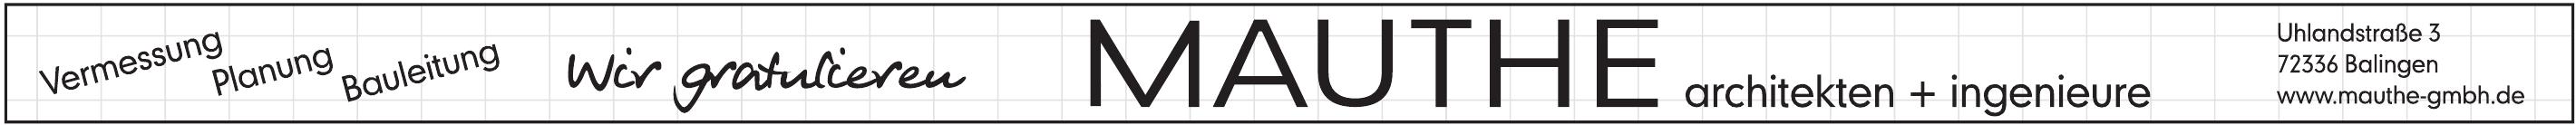 Mauthe GmbH Architekten + Ingenieure